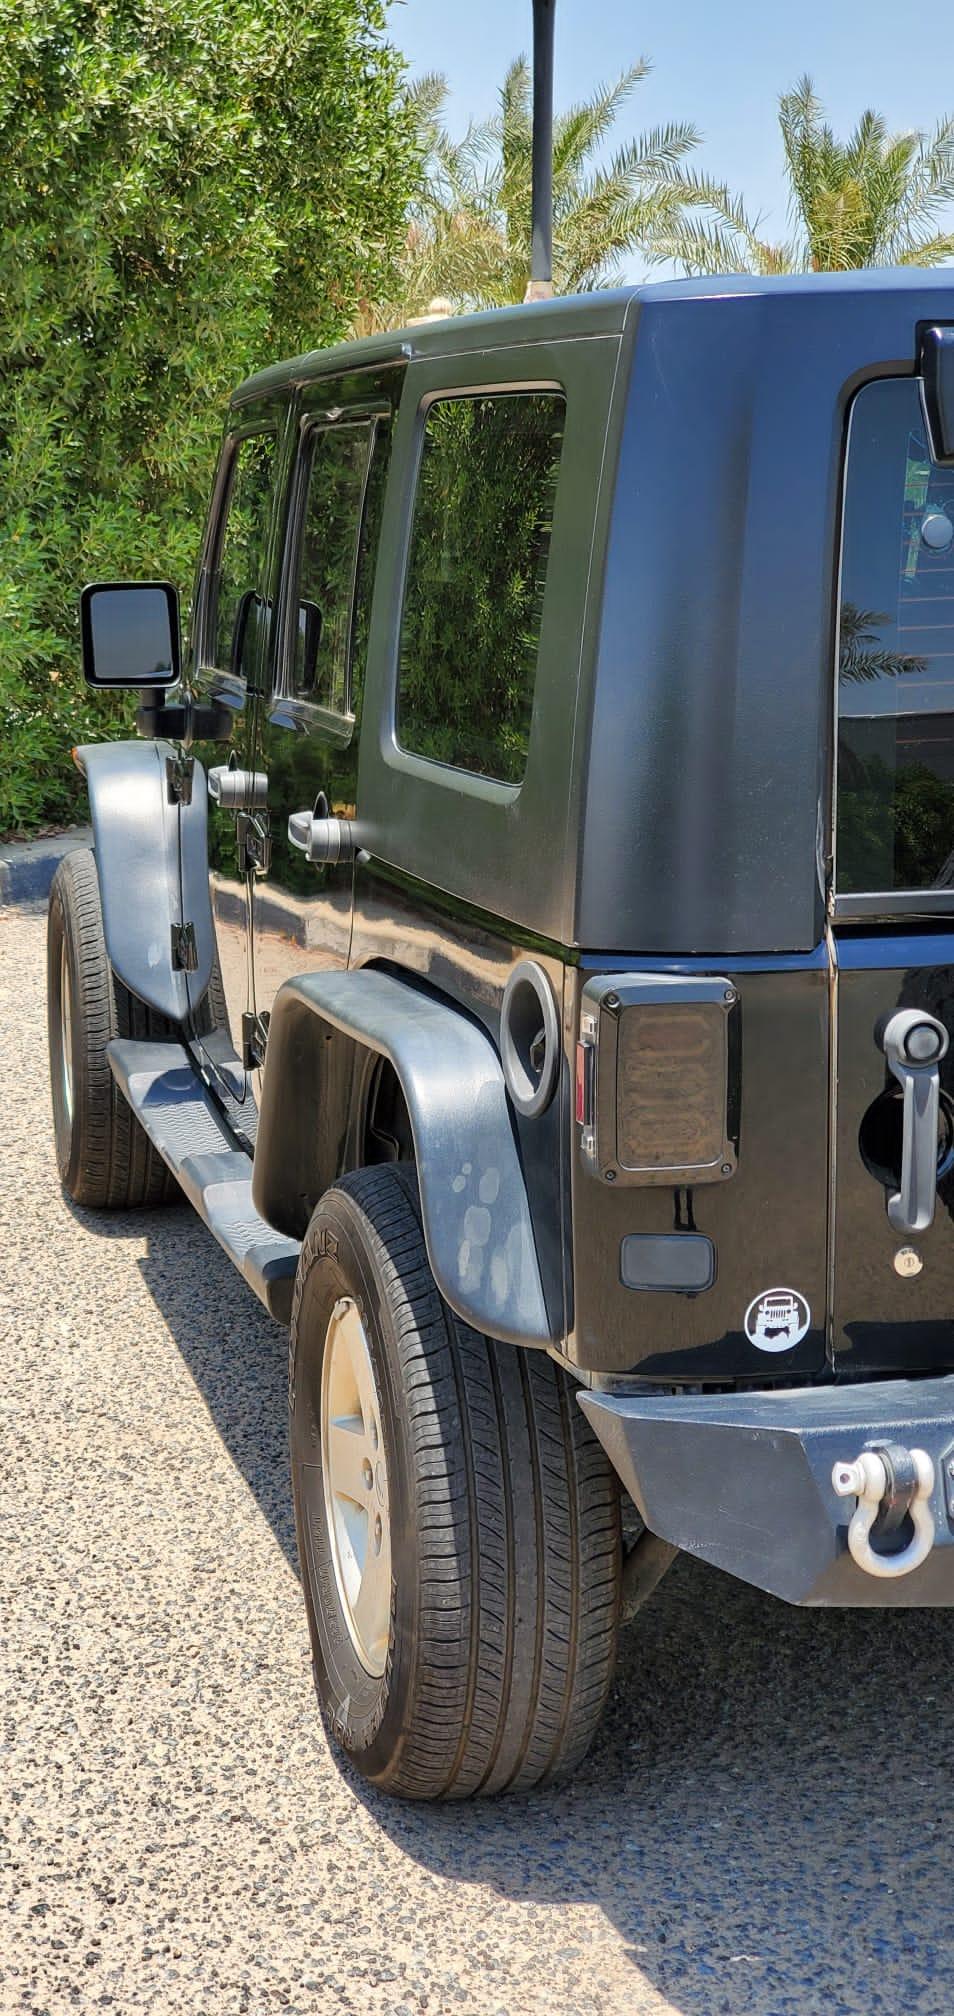 Jeep Wrangler Sahara Unlimited 2010